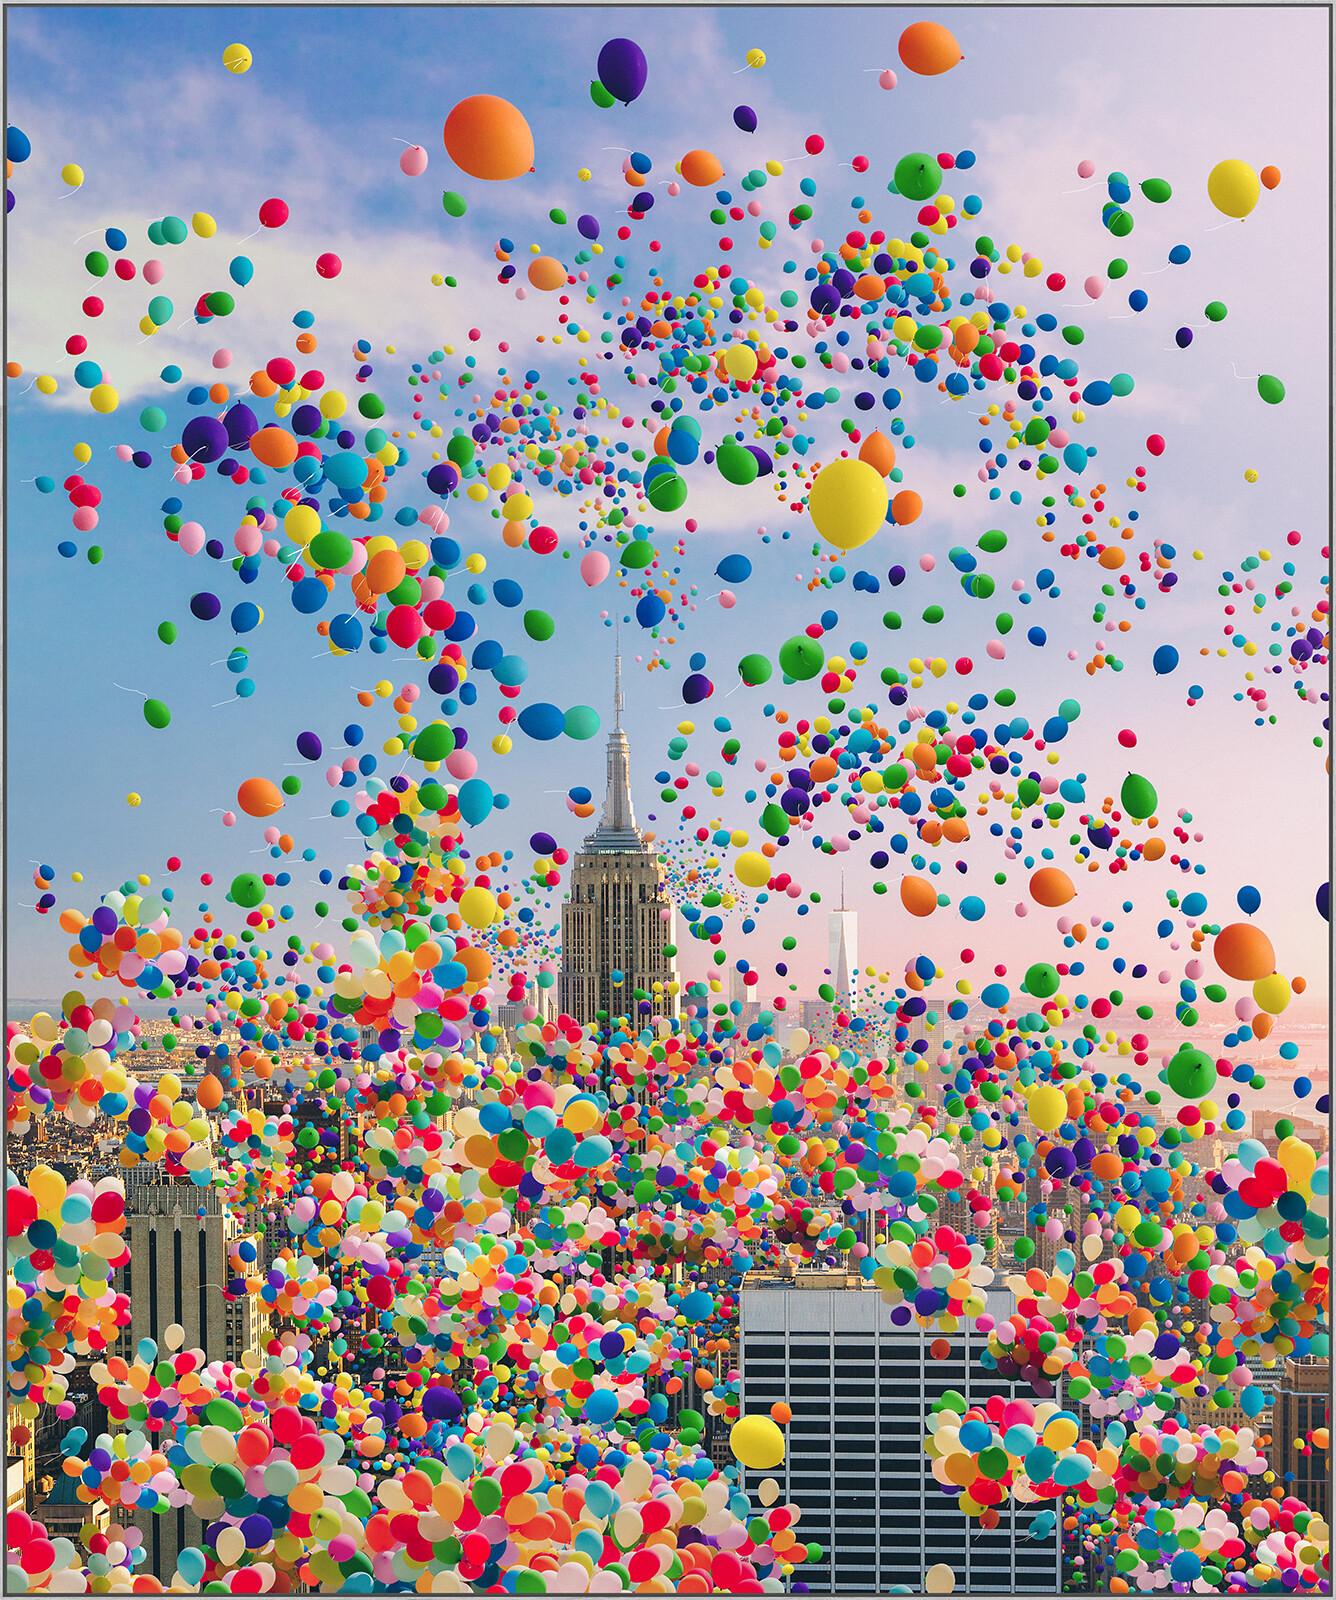 NYC Balloons - Robert Jahns